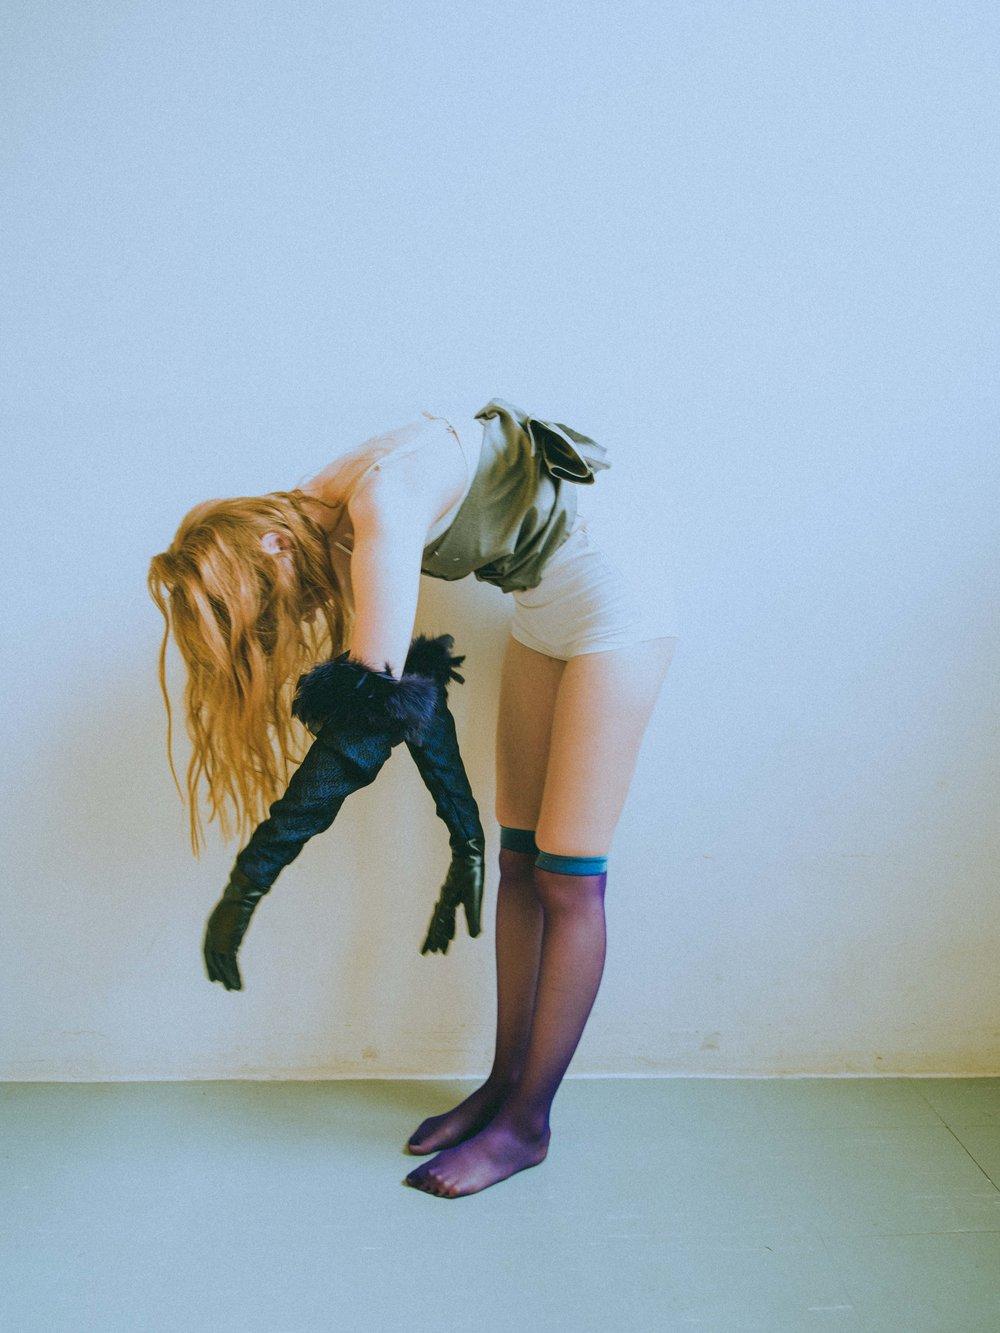 arm NOVO STUDIO, bustier MAISON MARTIN MARGIELA, socks VINTAGE